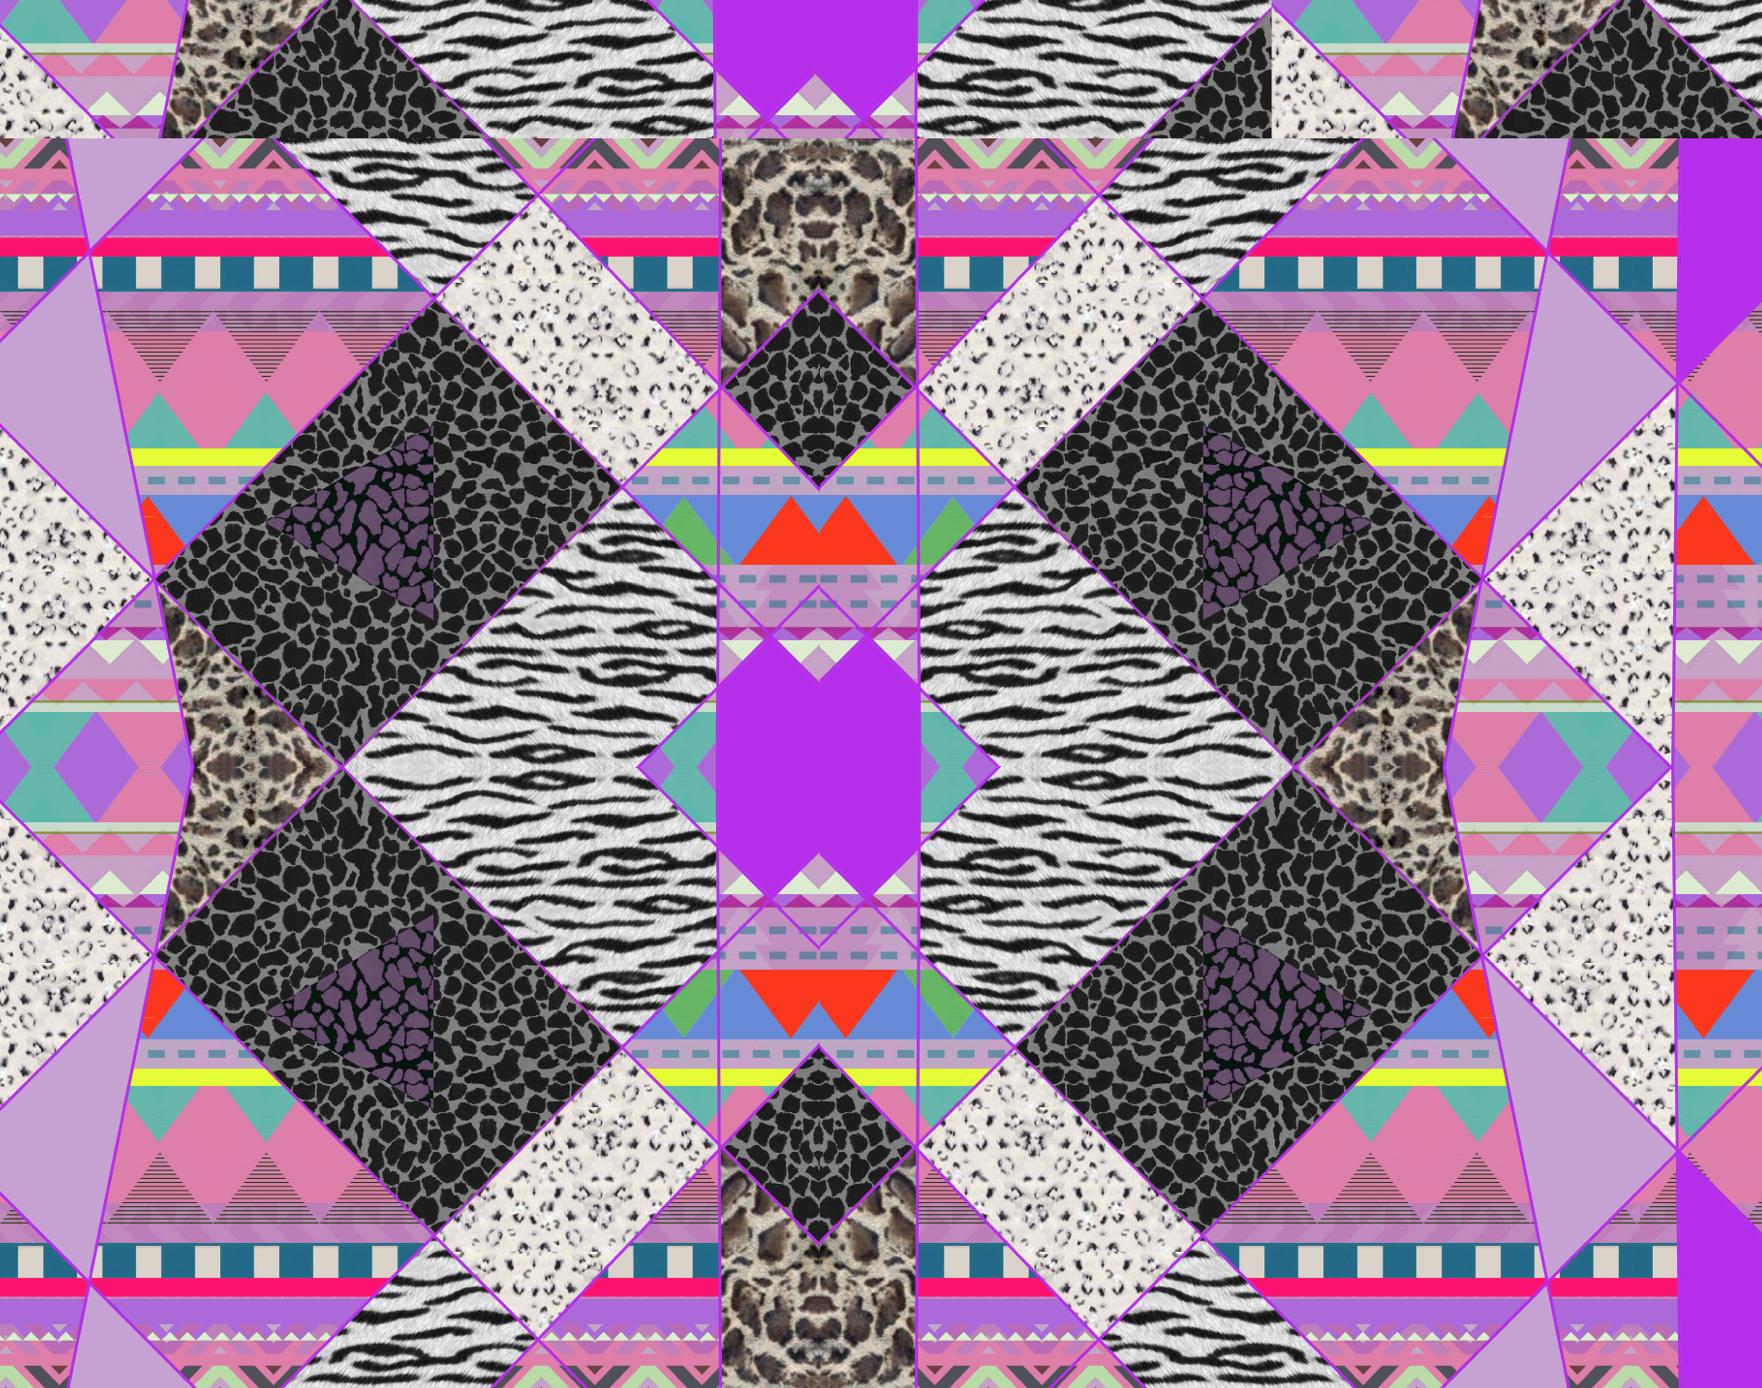 Aztec Native Navajo Geometric Motif African Vibrant Pattern Background Facebook Hipster Tumblr Society6 Art Design Repeat Artist Freelance Fabric Textile